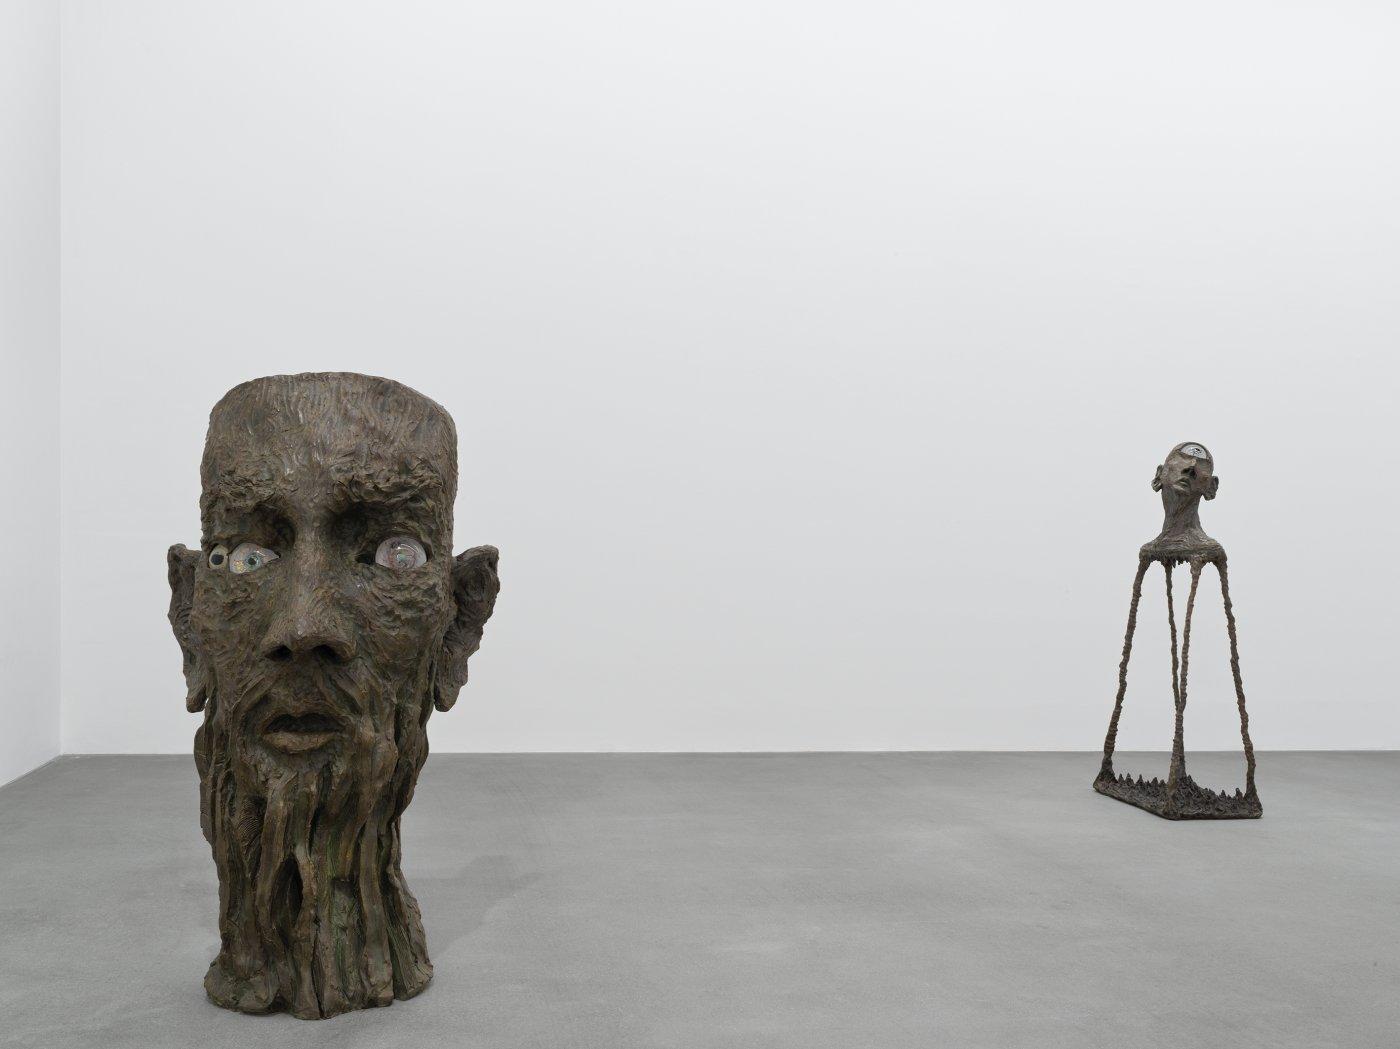 Galerie Eva Presenhuber Waldmanstrasse Jean-Marie Appriou 3